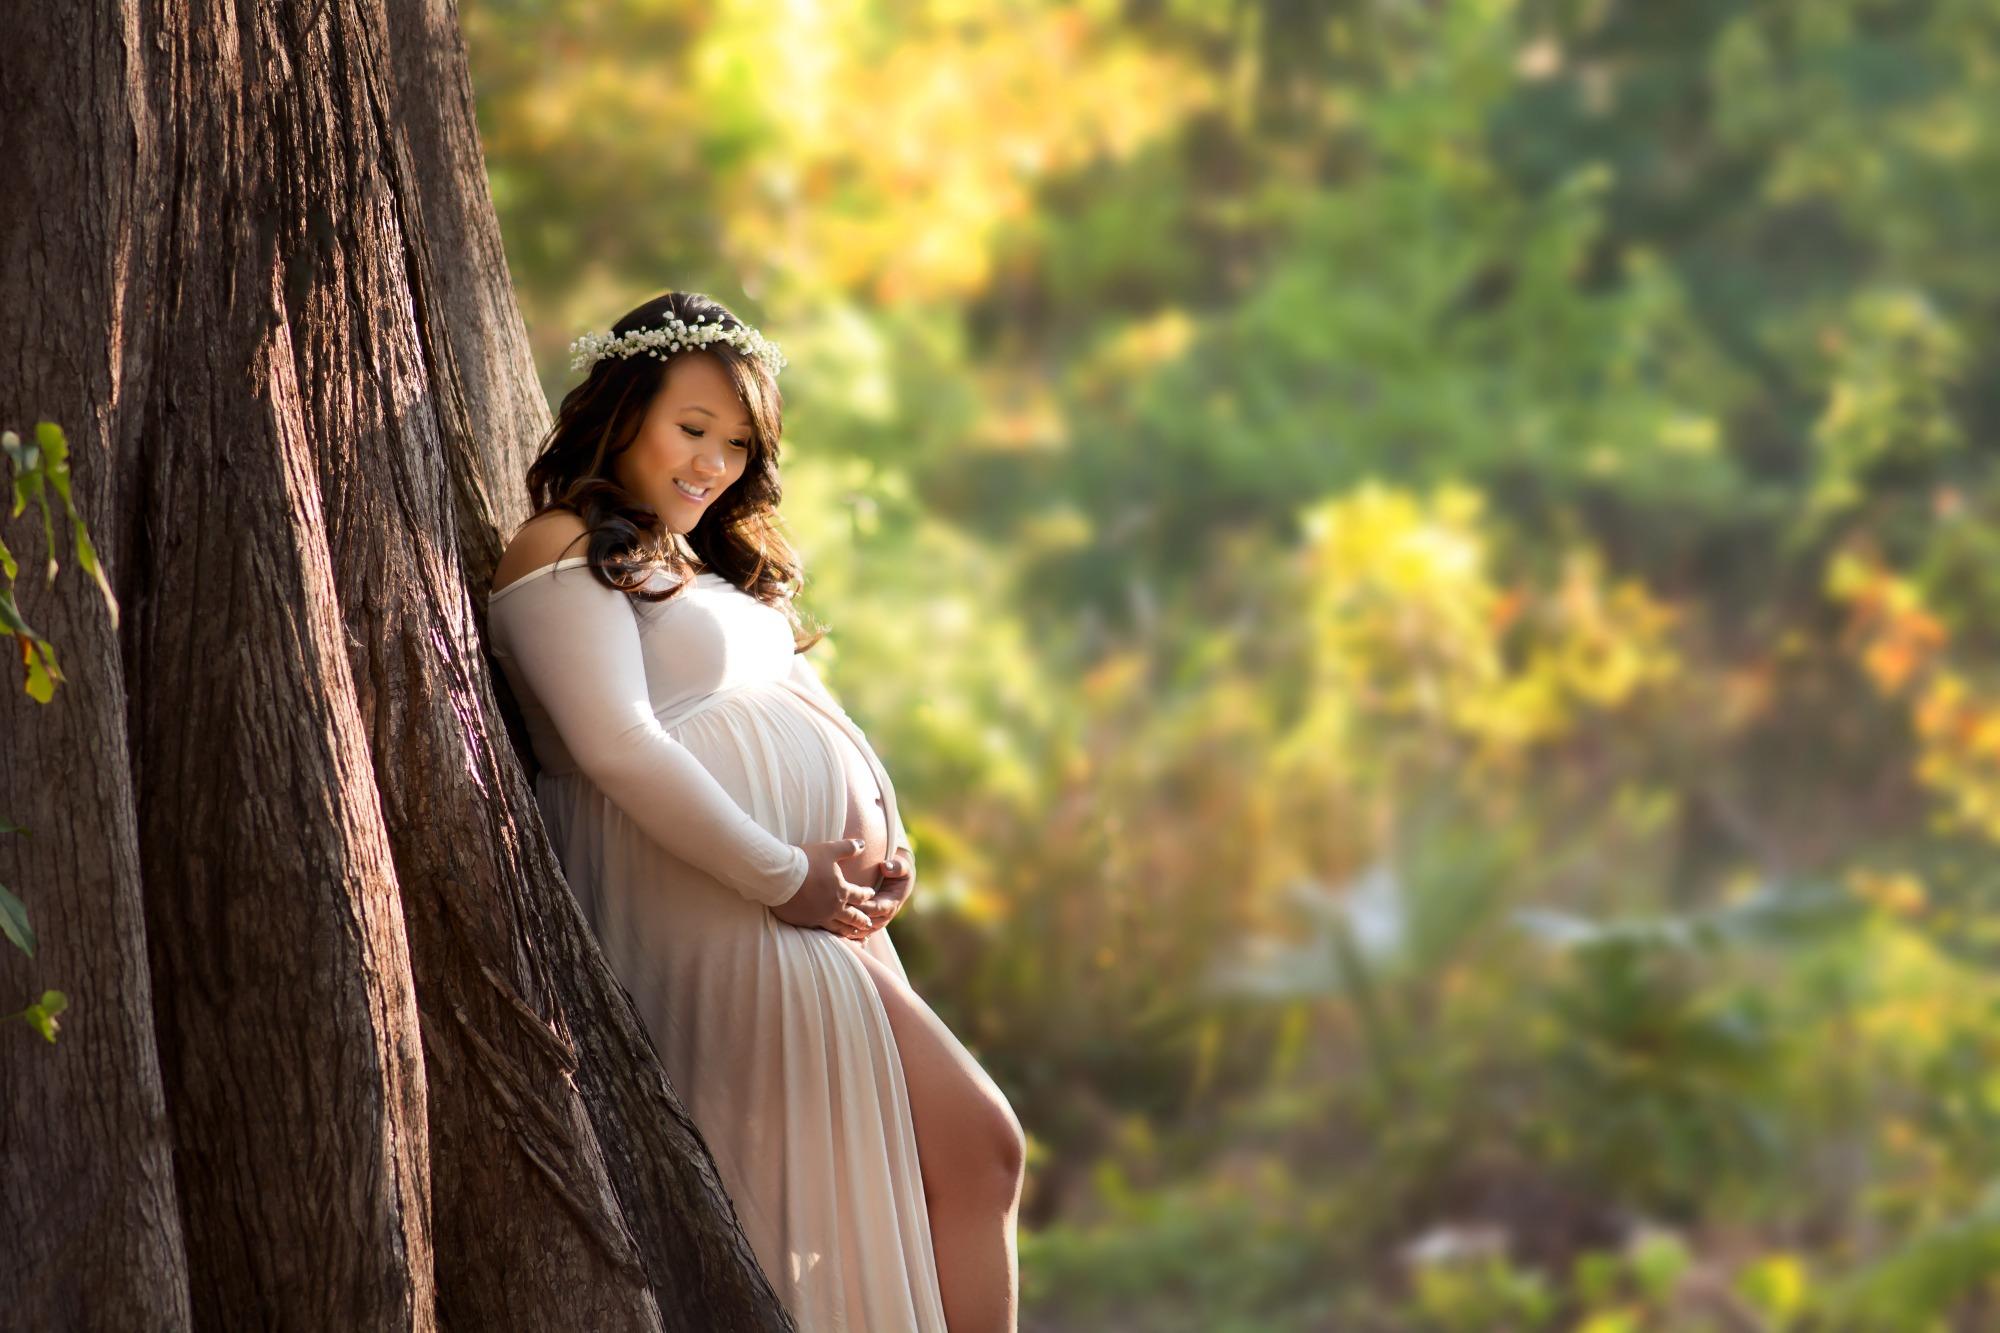 orlando maternity photography